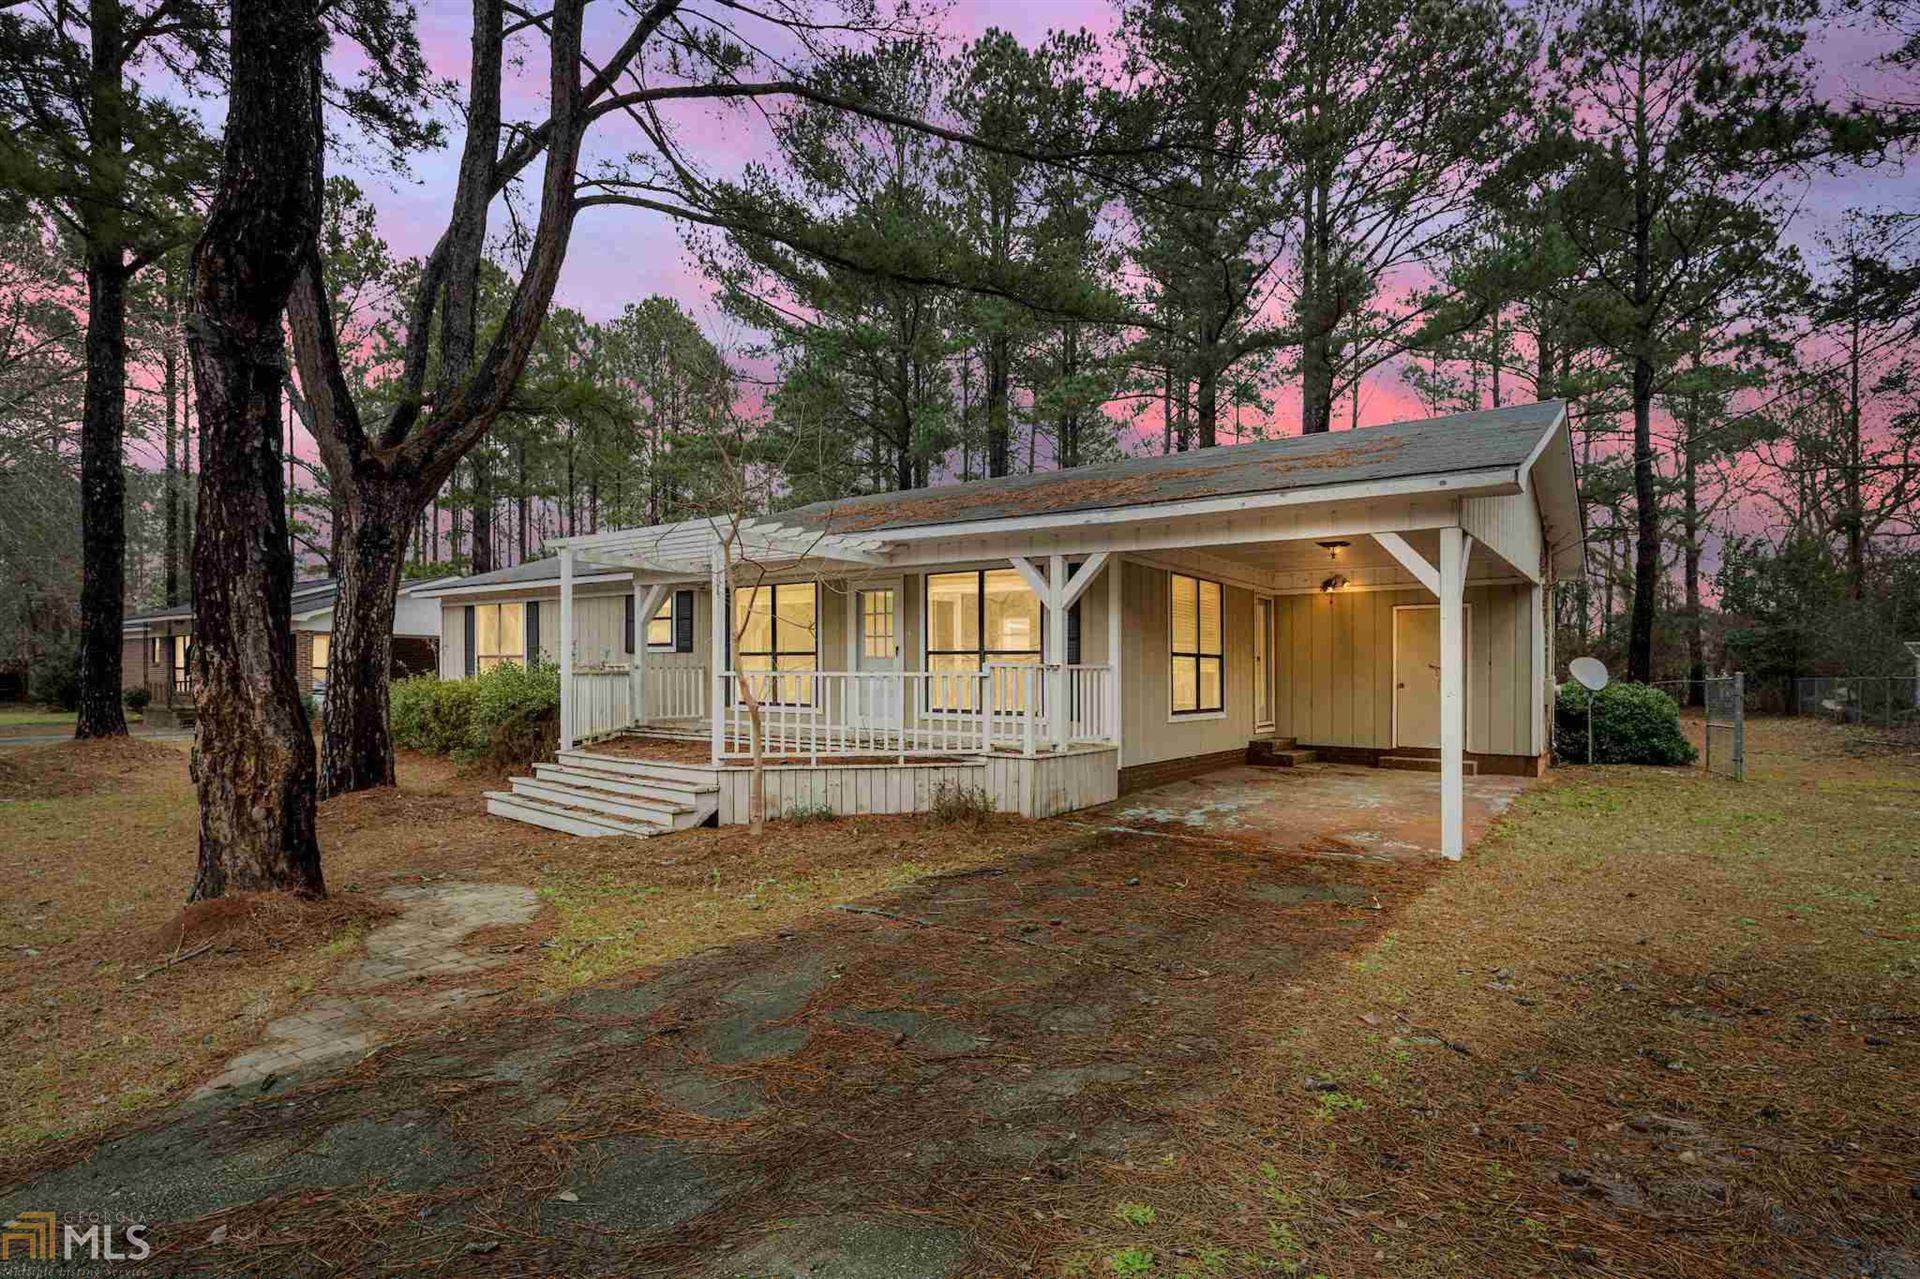 Photo of 619 Harrison St, Sandersville, GA 31082 (MLS # 8856002)